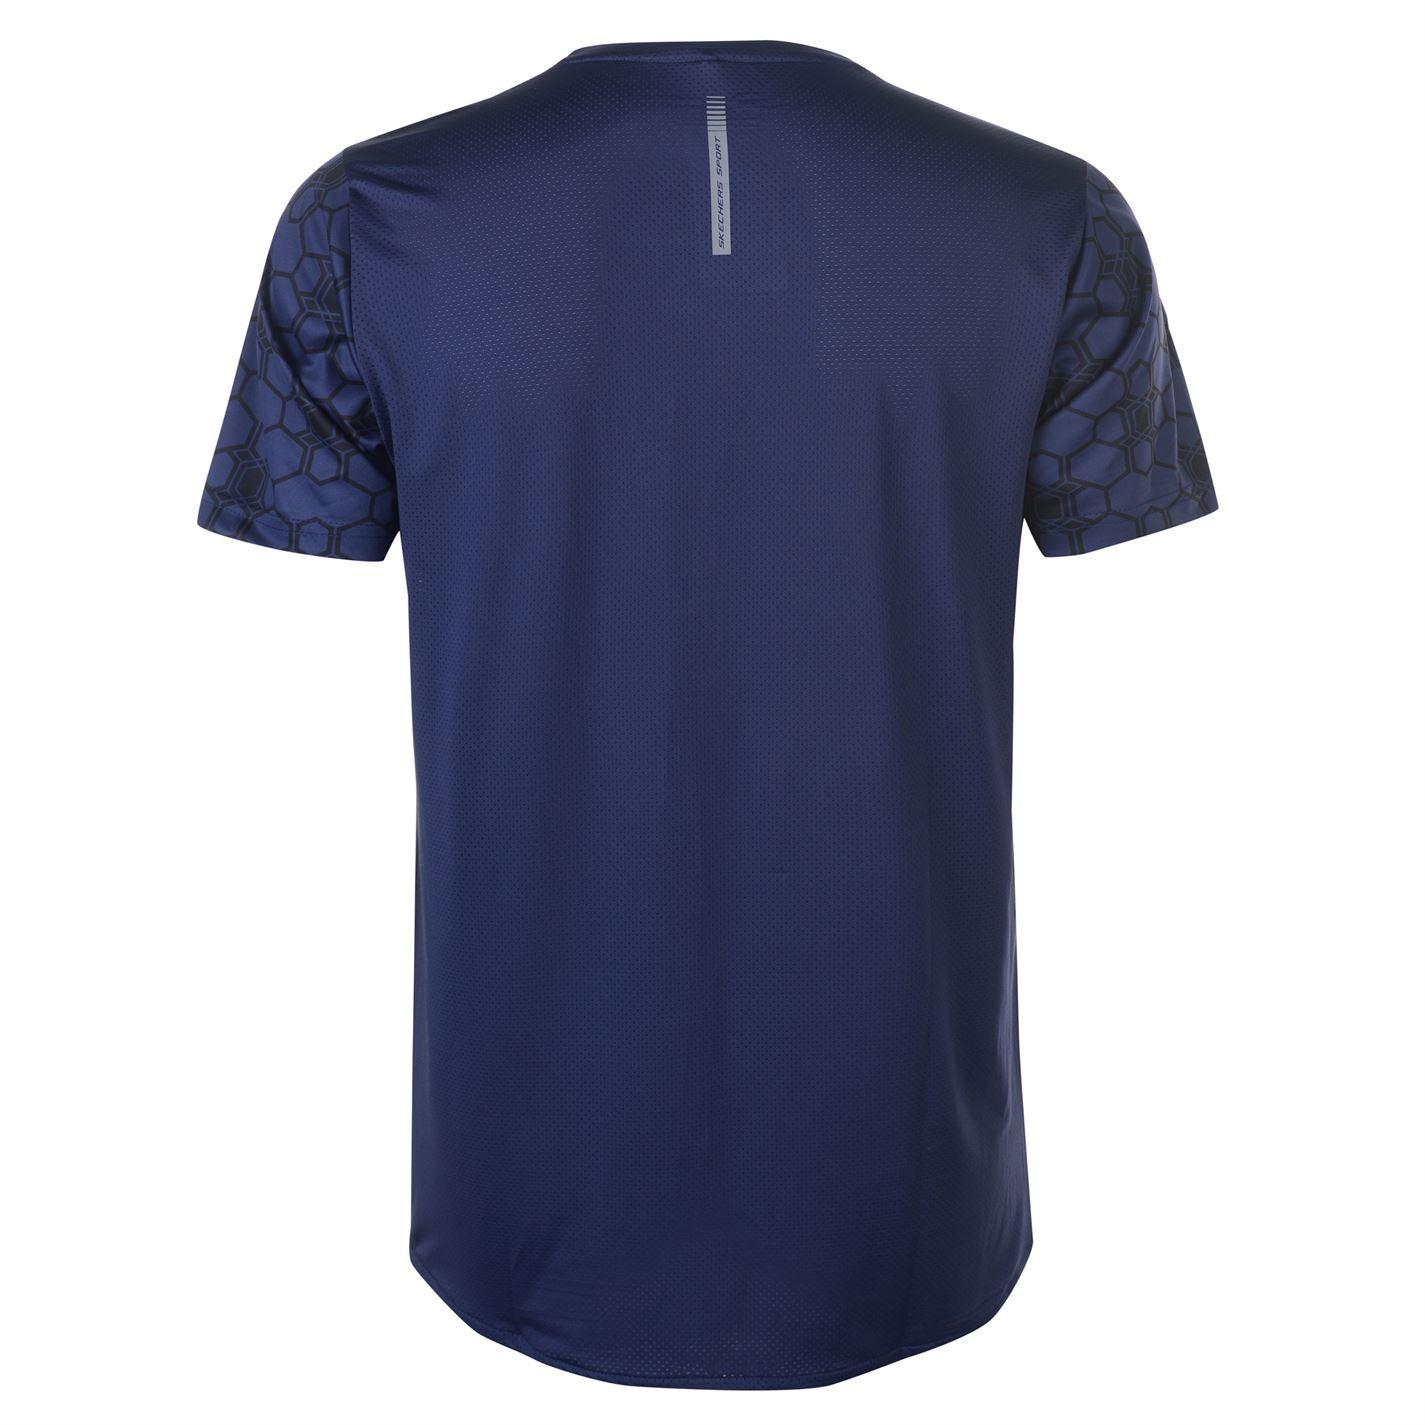 Skechers-Mens-Aop-Camiseta-Mangas-Cortas-Cuello-Redondo-Camiseta-Top-Performance miniatura 11